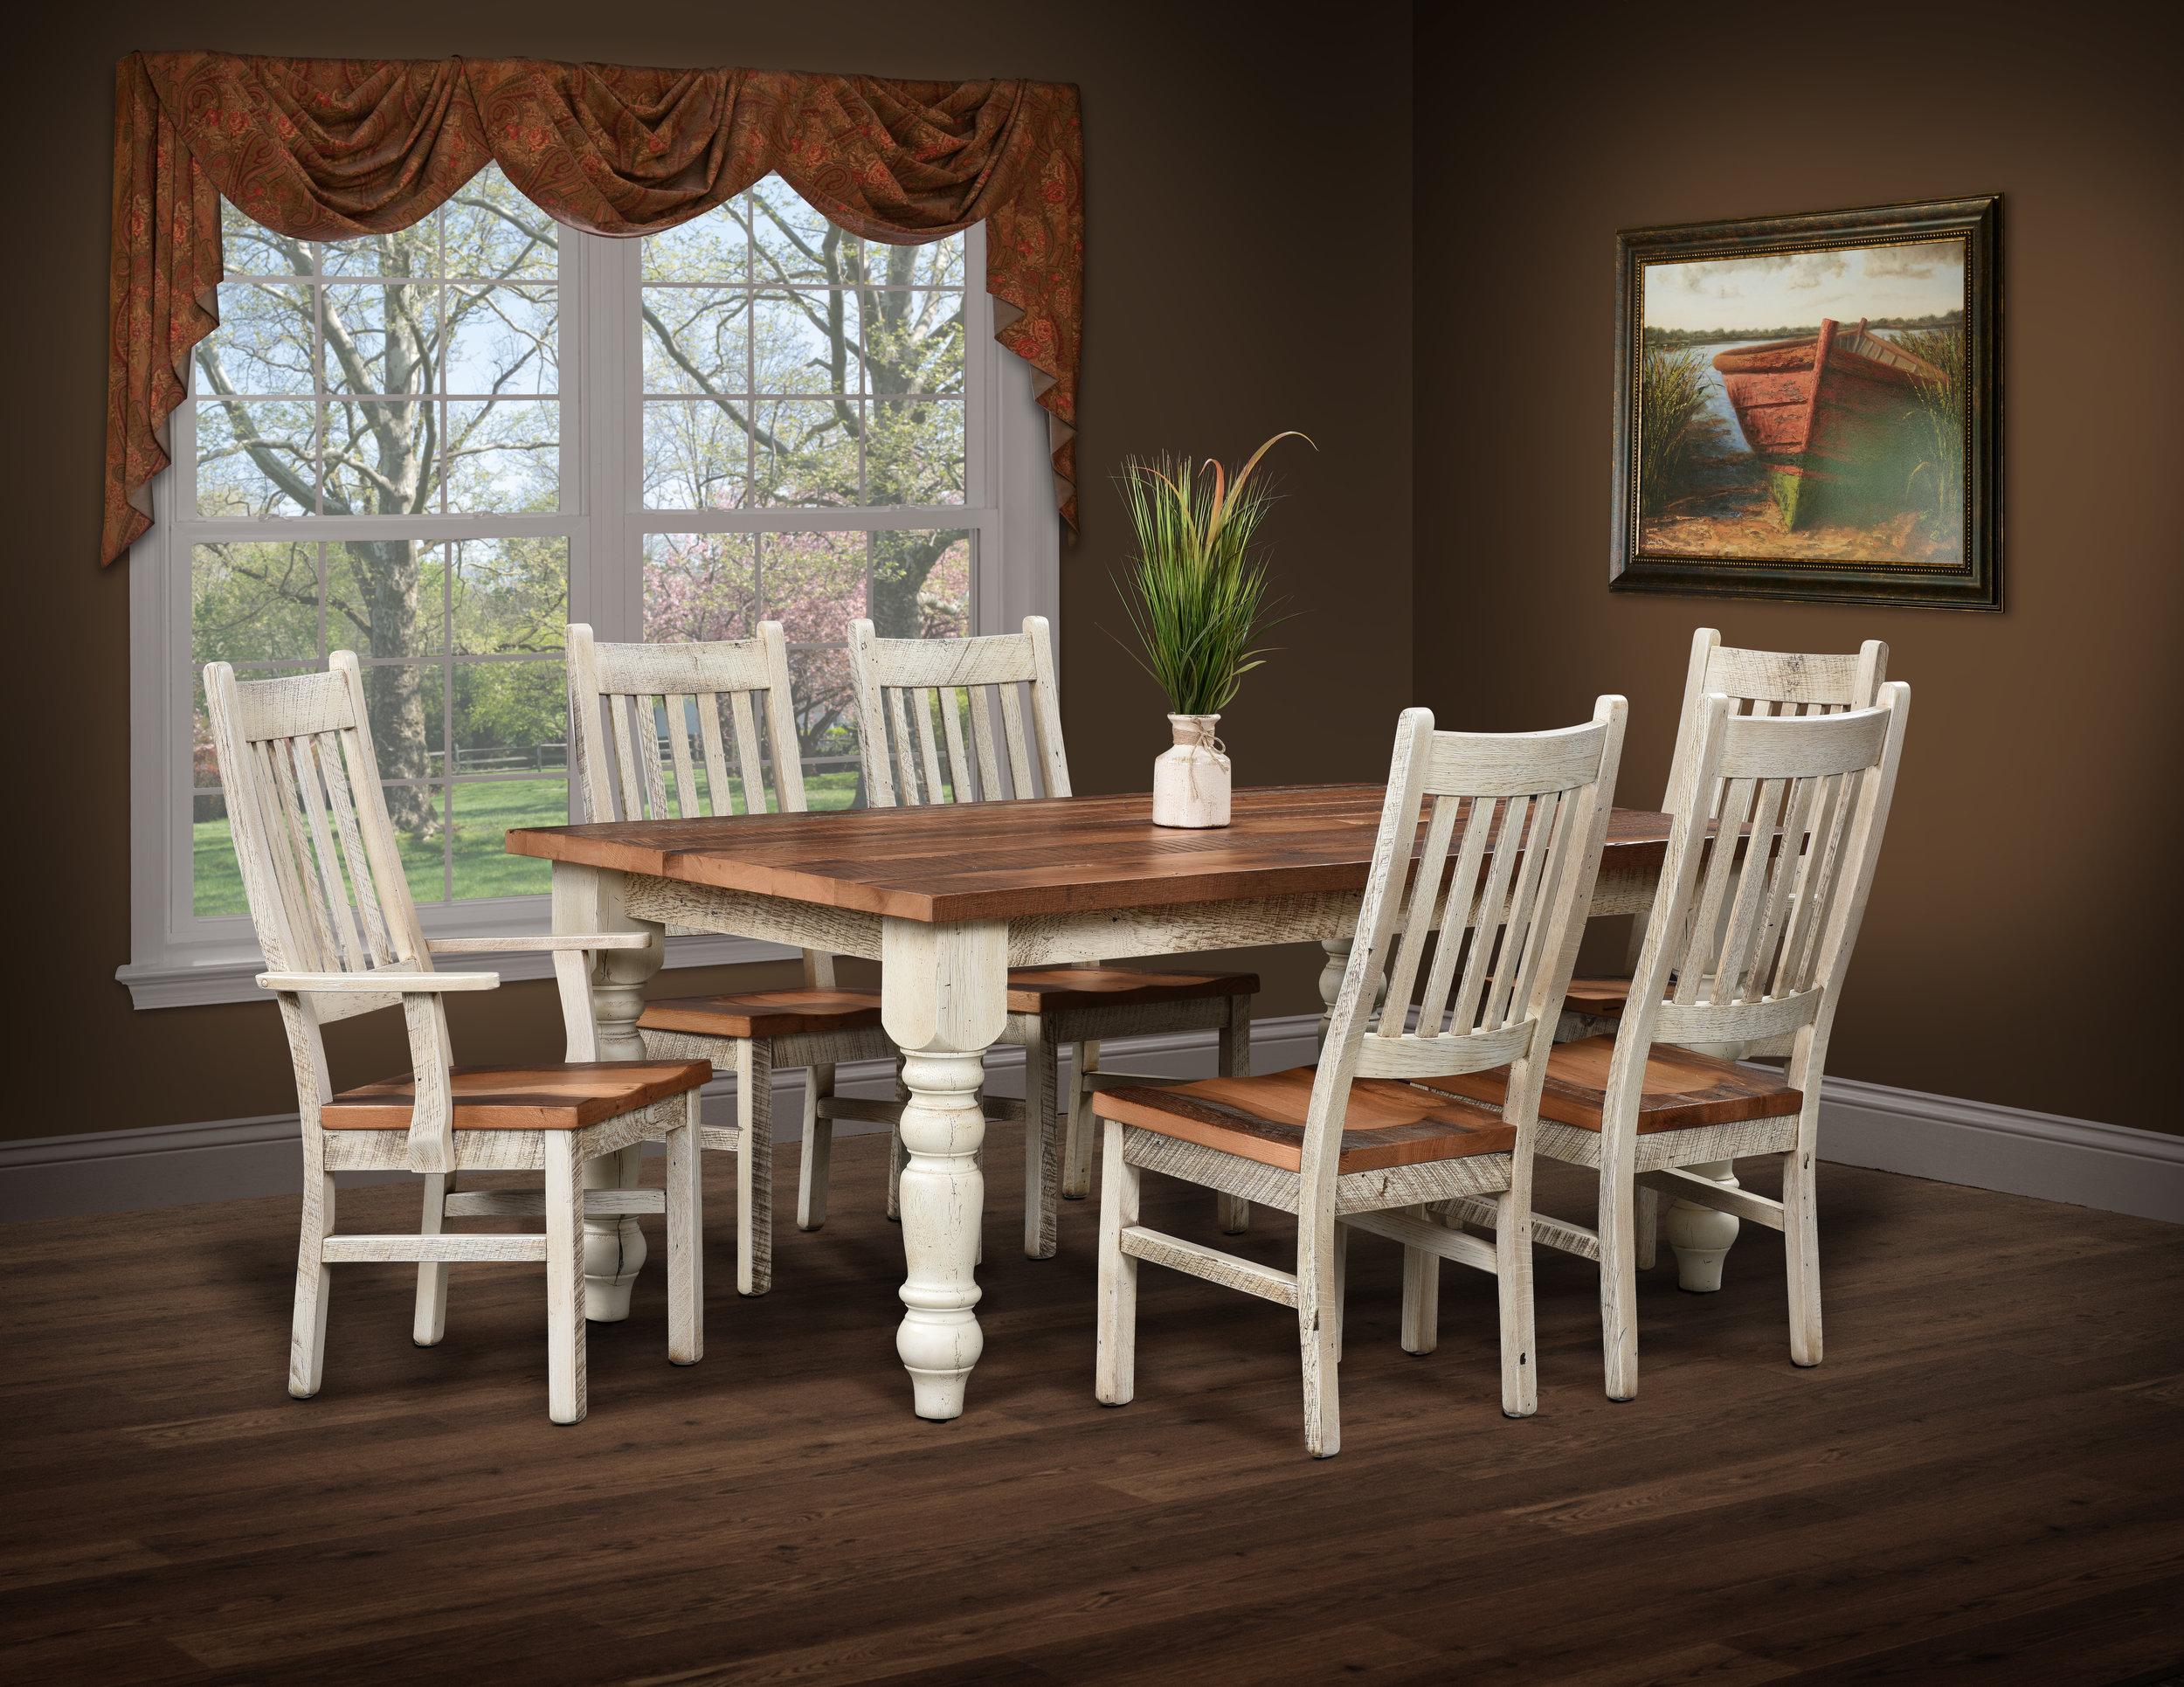 Barnwood Furniture for sale in Western Pennsylvania.